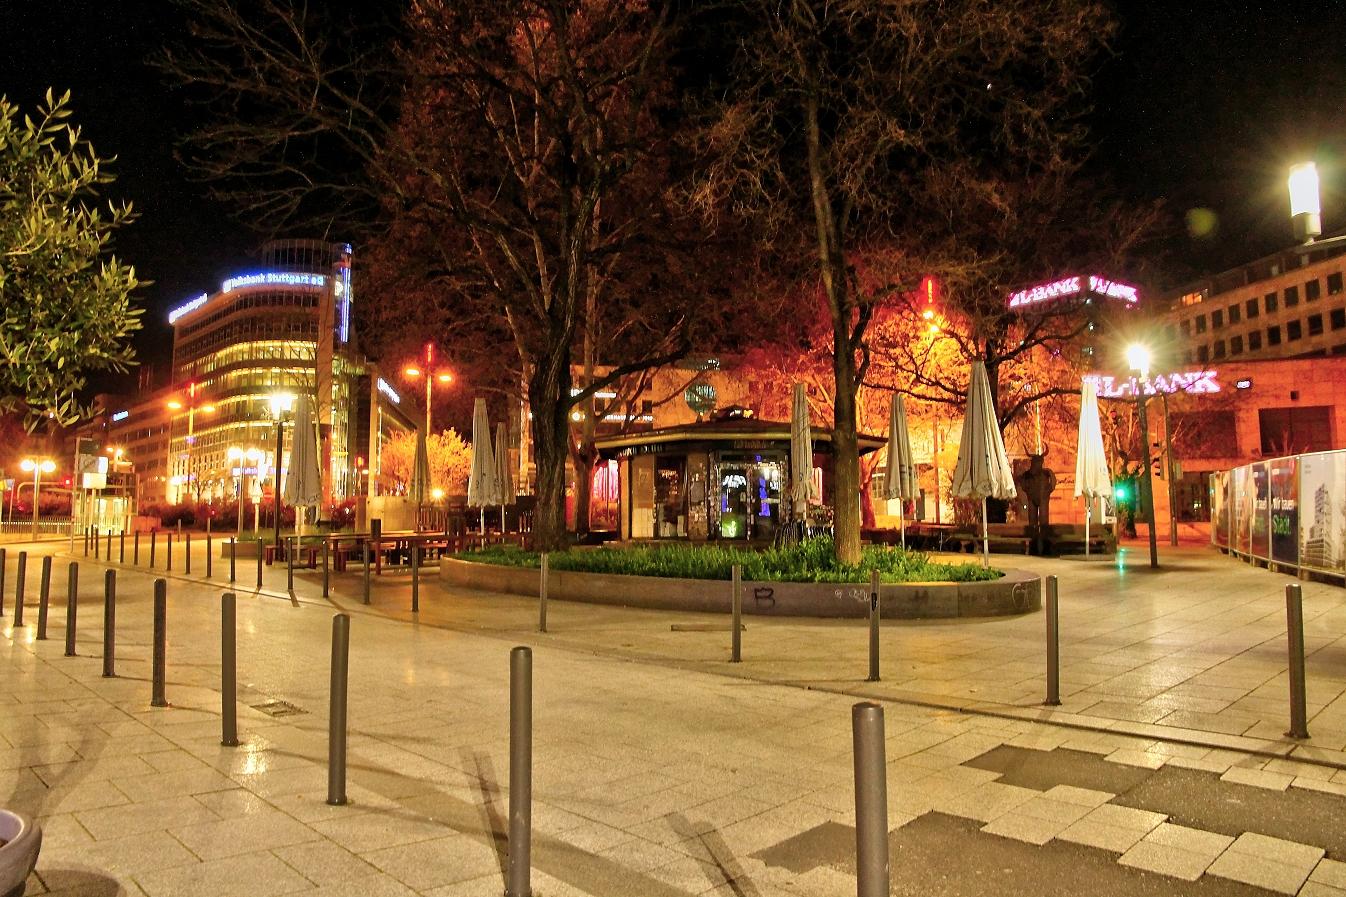 Kino Schillerplatz